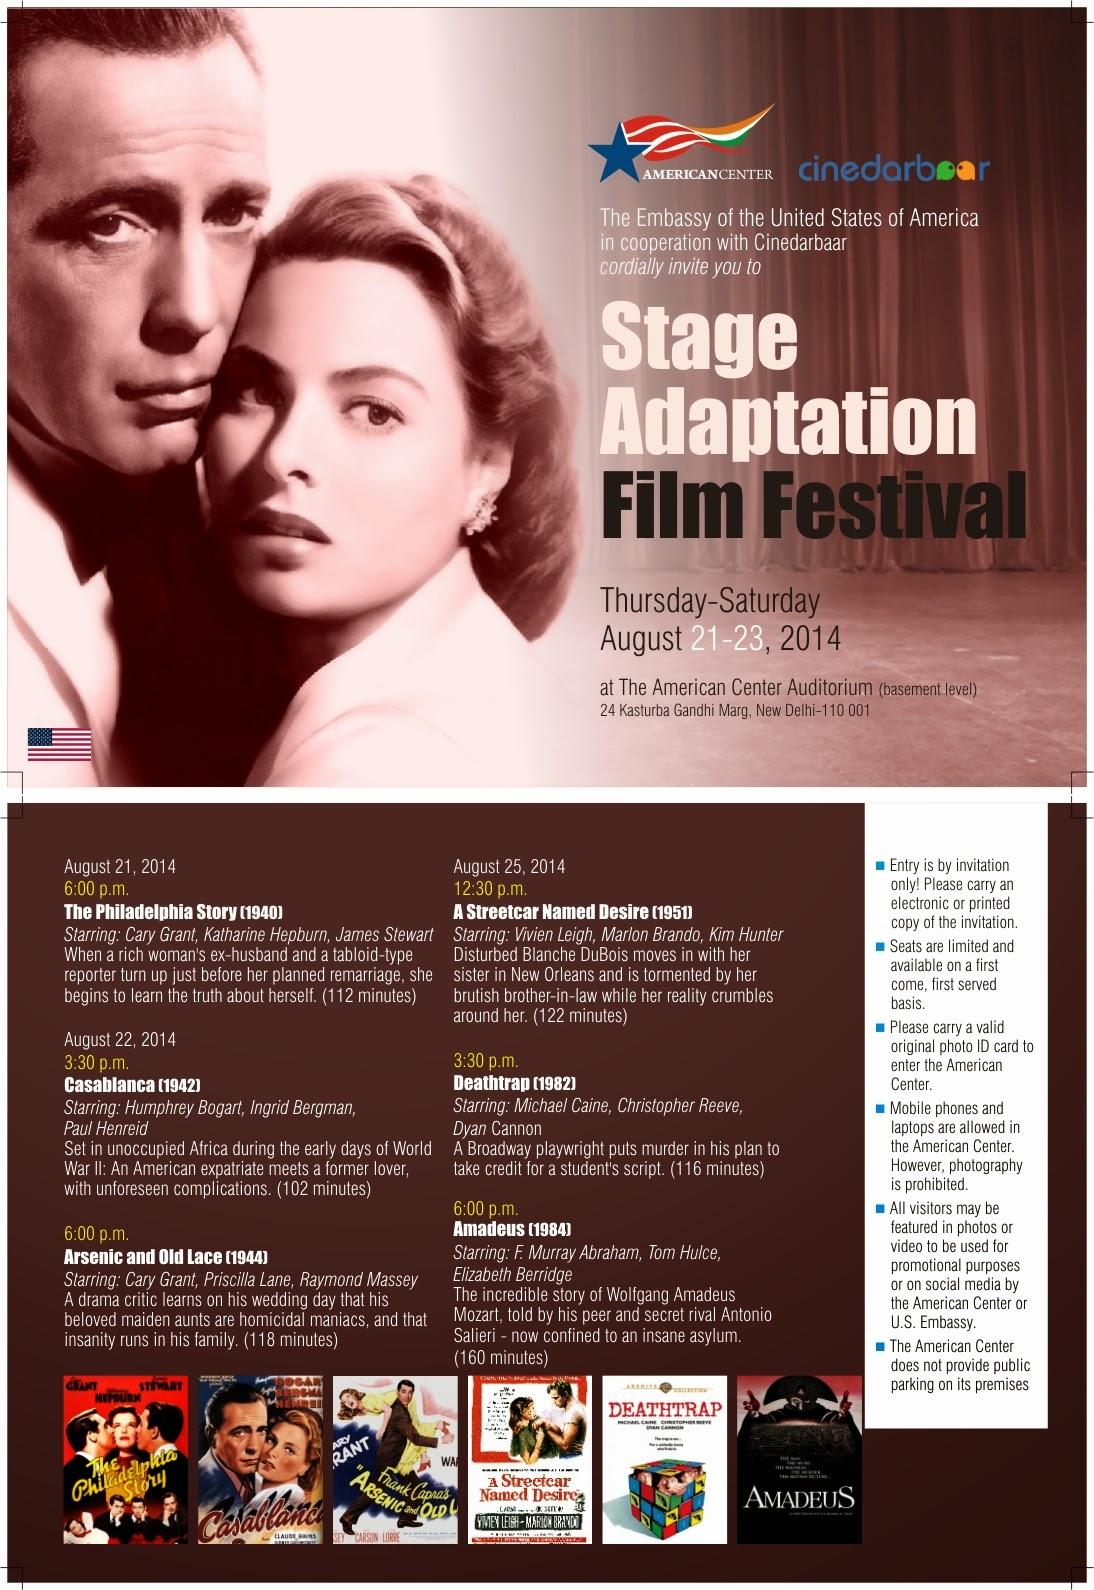 Stage Adaptation Film Festival, Festival Poster, American Center, Cinedarbar